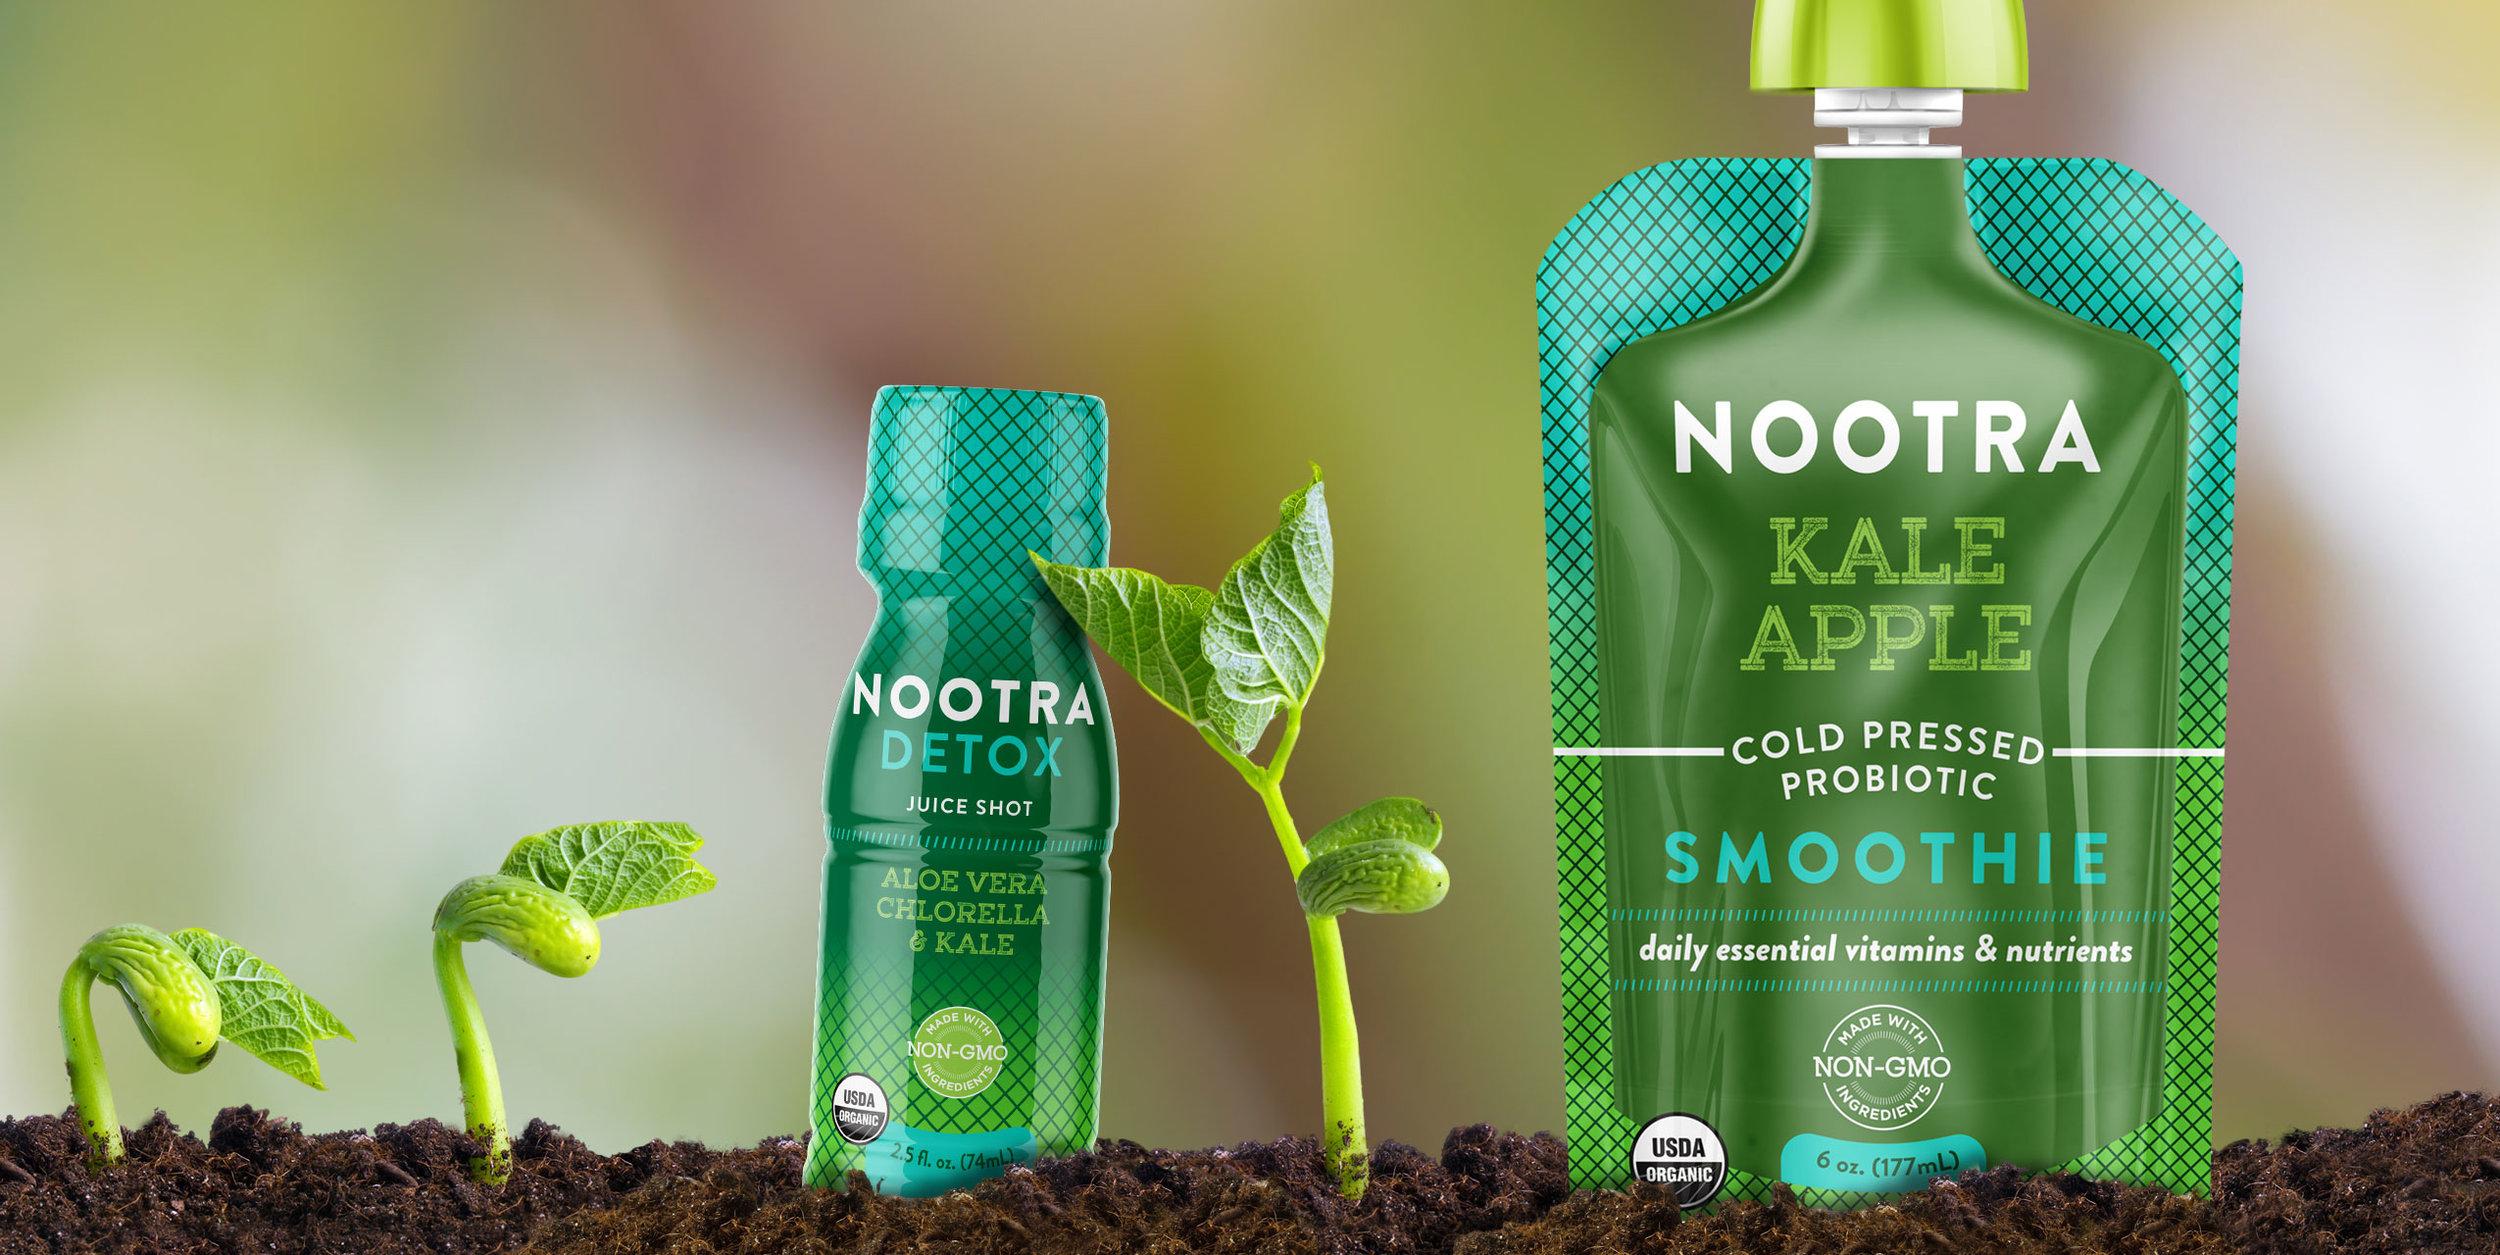 NOOTRA-WEB-LP-Kale-Apple-pb_Shot.jpg